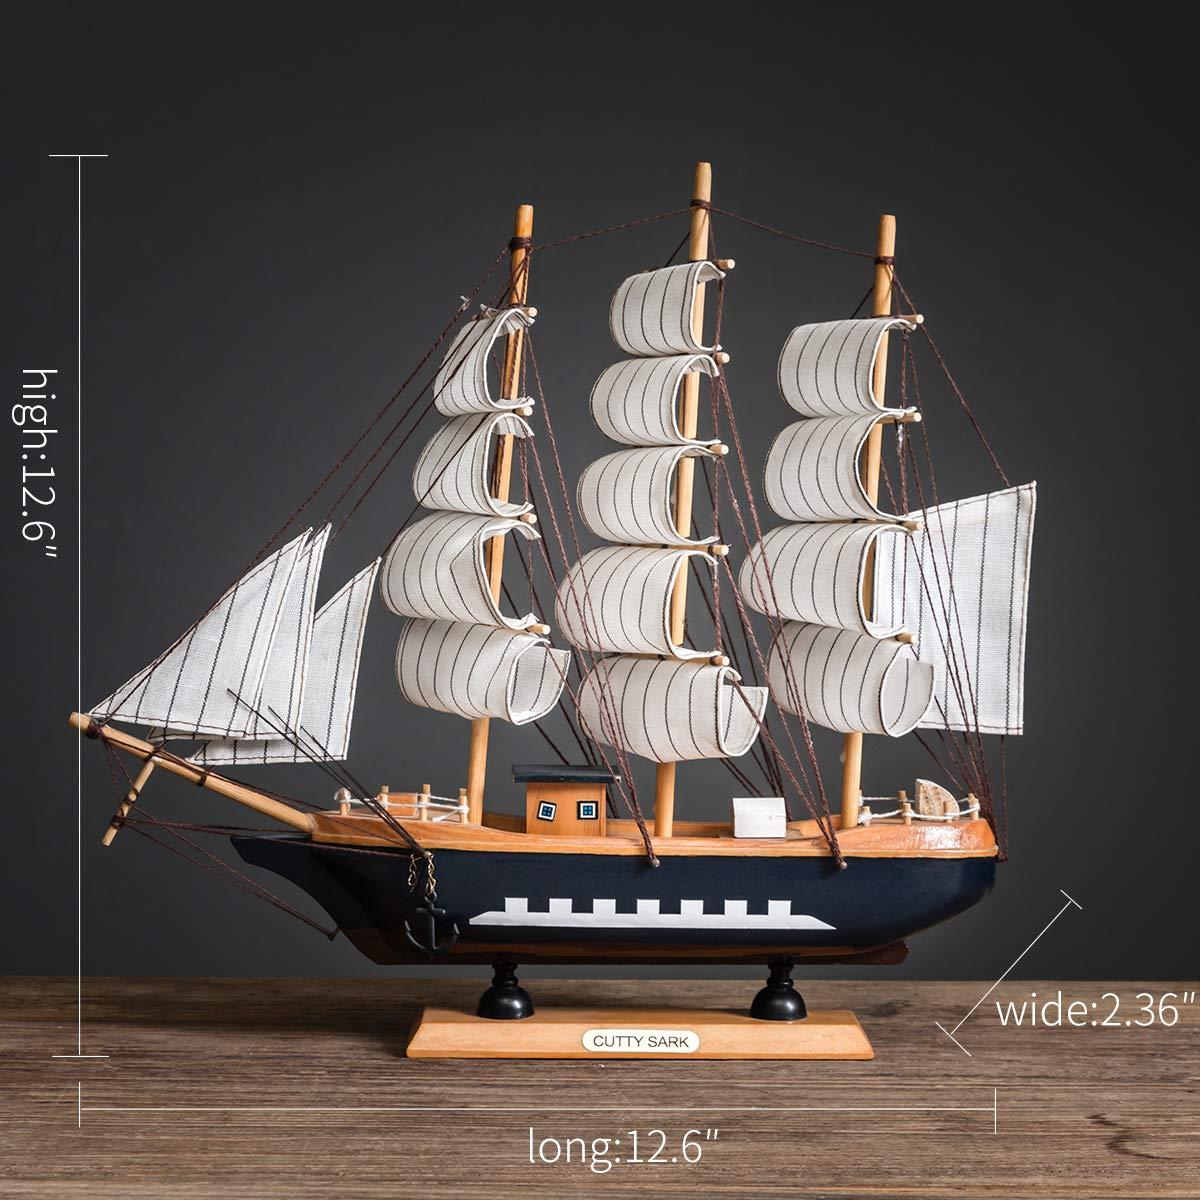 Model Ship Nautical Decor,Wooden Sailing Boat Model Vintage Ship for Tabletop Ornament Ocean Theme Home Decor 15 Colors A